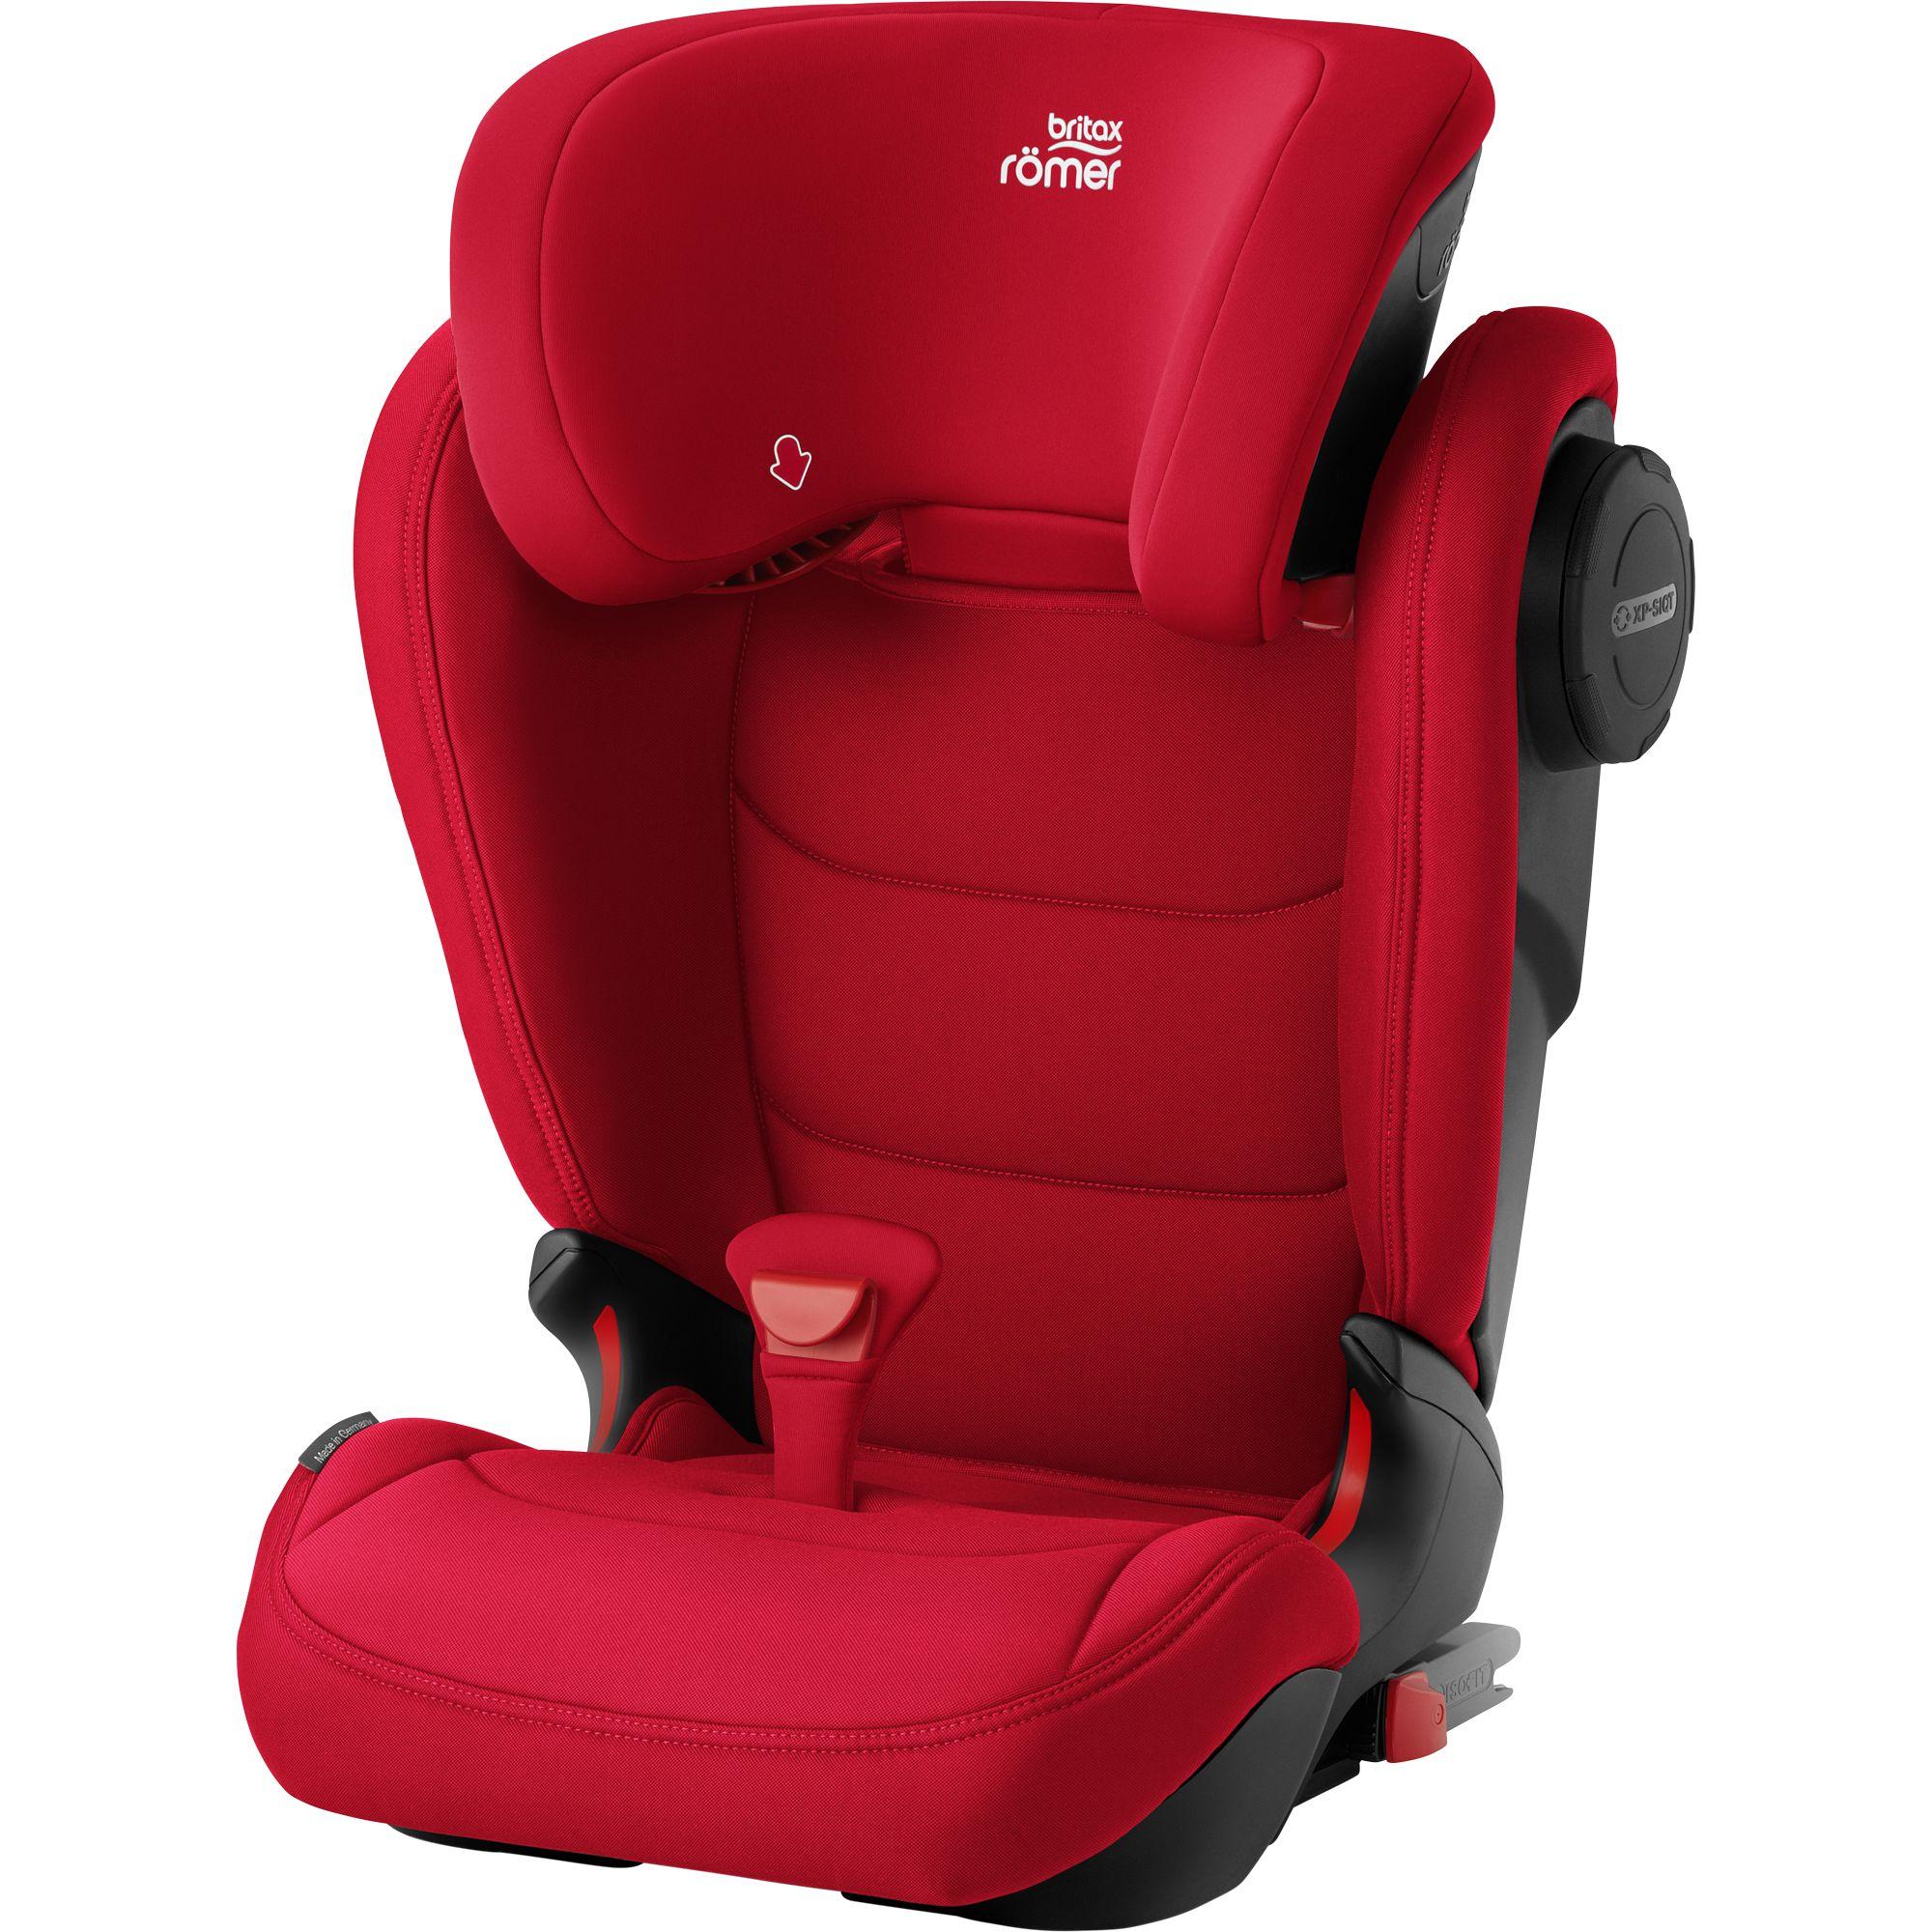 ROMER Kidfix III M Fire Red 2021